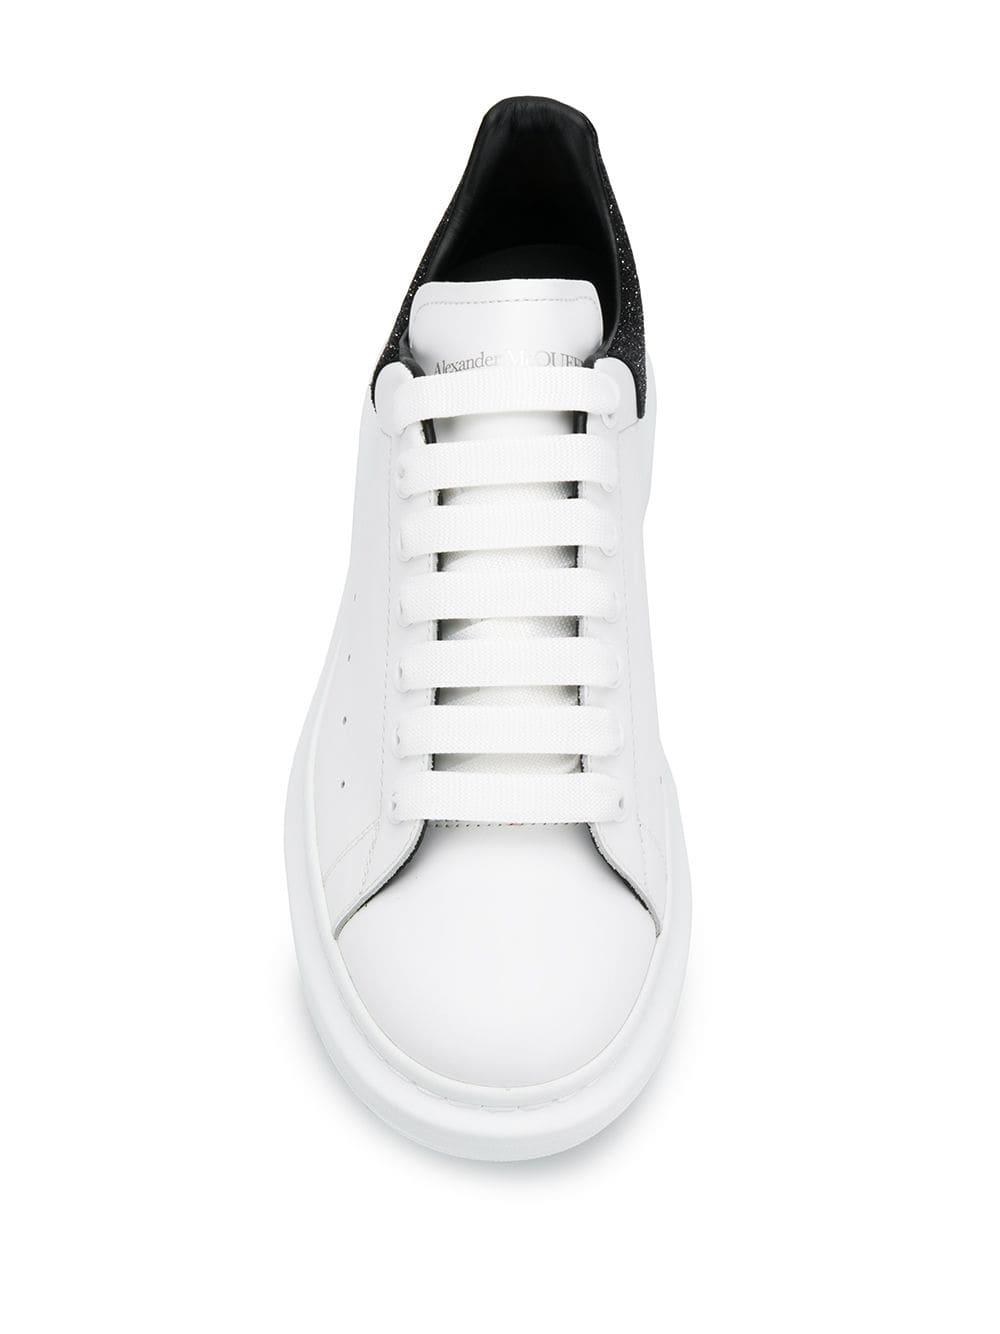 Baskets Oversized Cuir Alexander McQueen en coloris Blanc vlG5